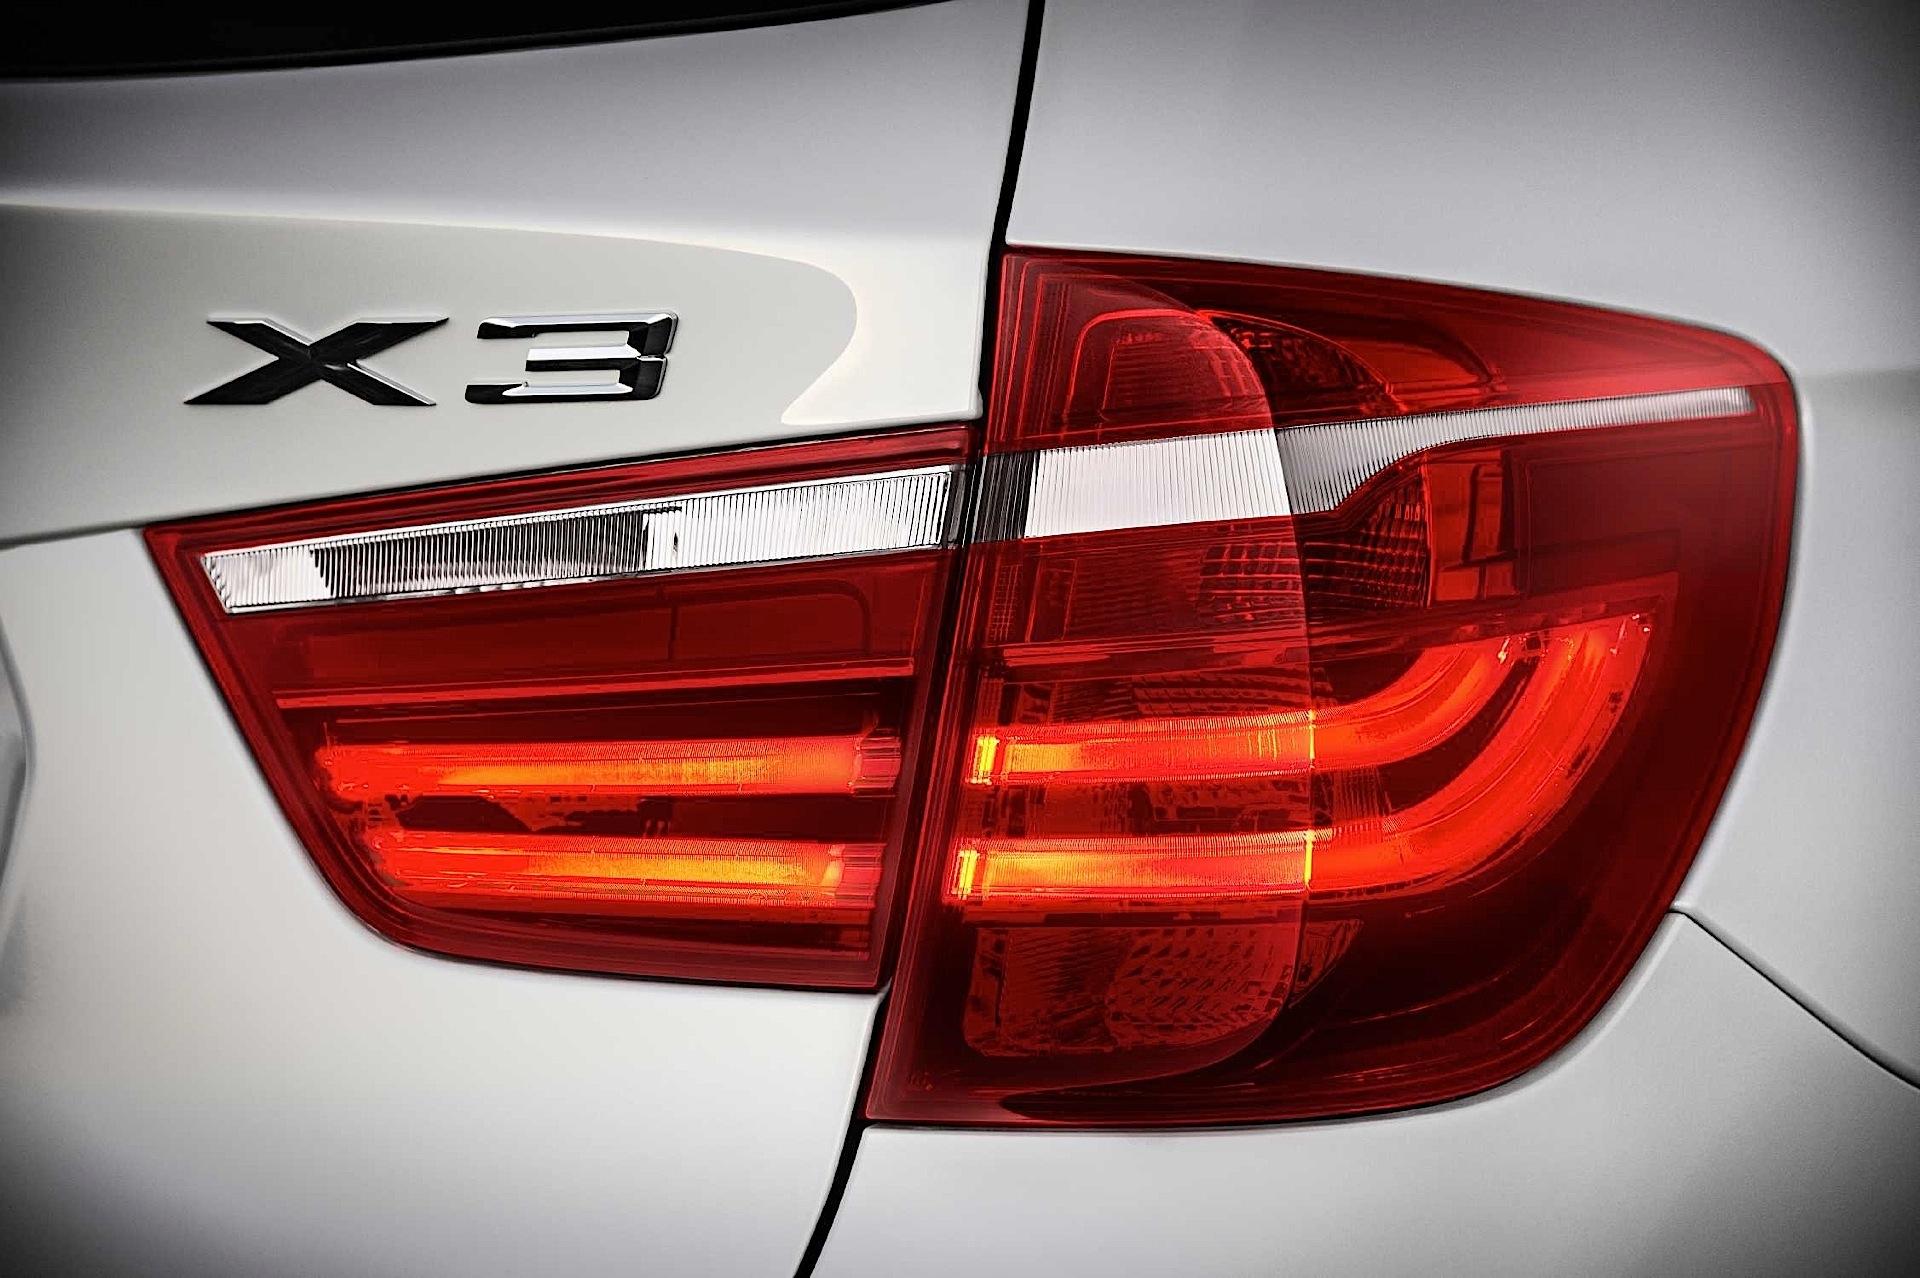 BMW X3 (F25) specs & photos - 2014, 2015, 2016, 2017 - autoevolution